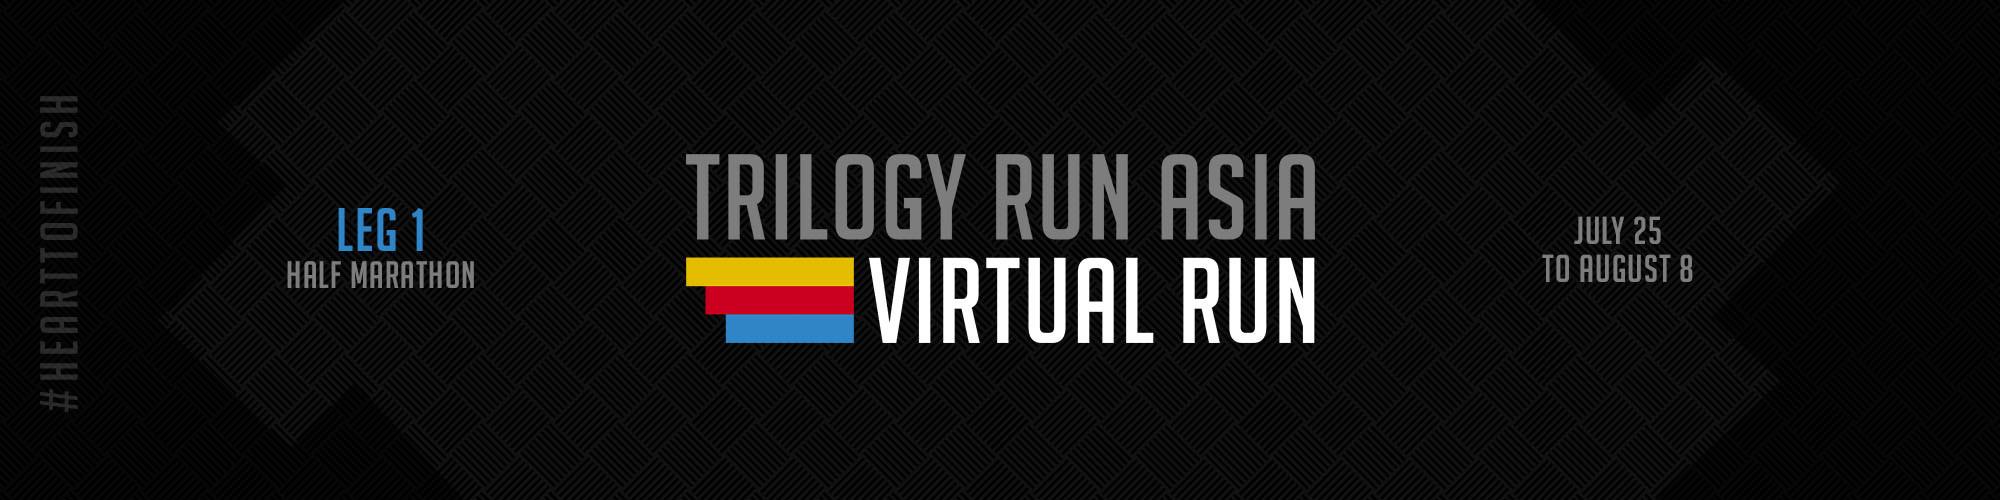 TRILOGY RUN ASIA 2020 Leg 1 - VIRTUAL RUN